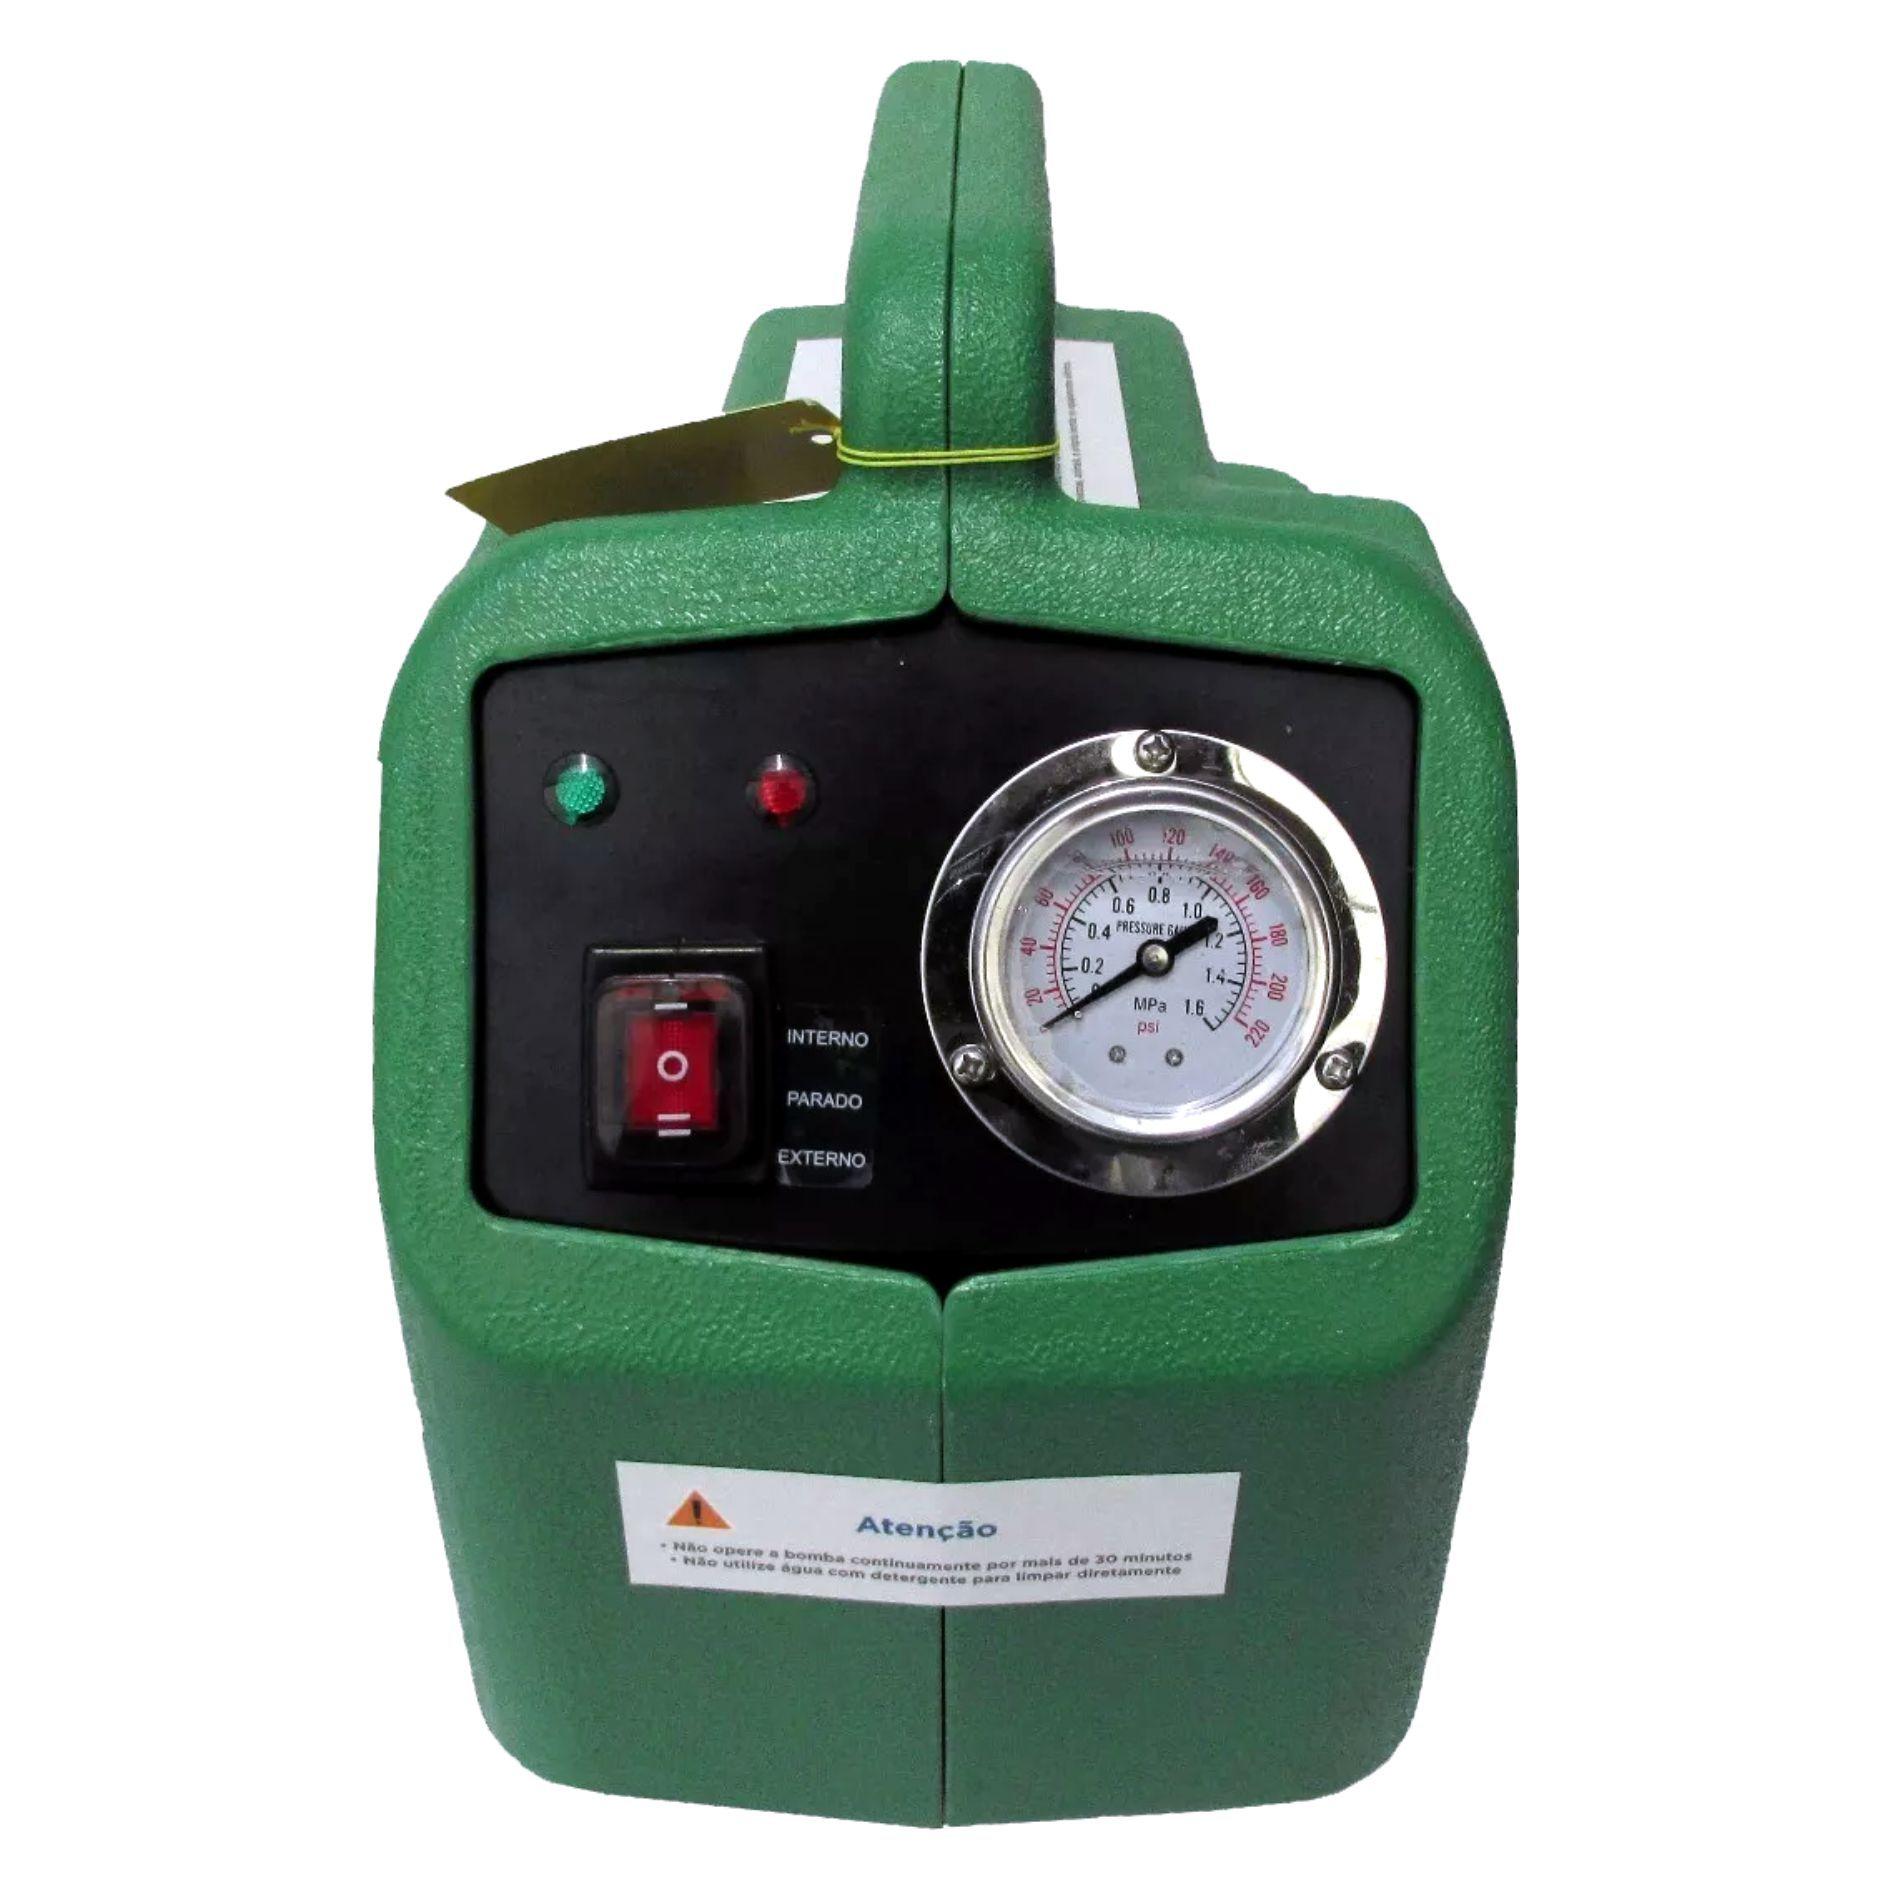 Máquina para Limpeza de Ar Condicionado Automática EOS 4S 220v 120PSI 80W